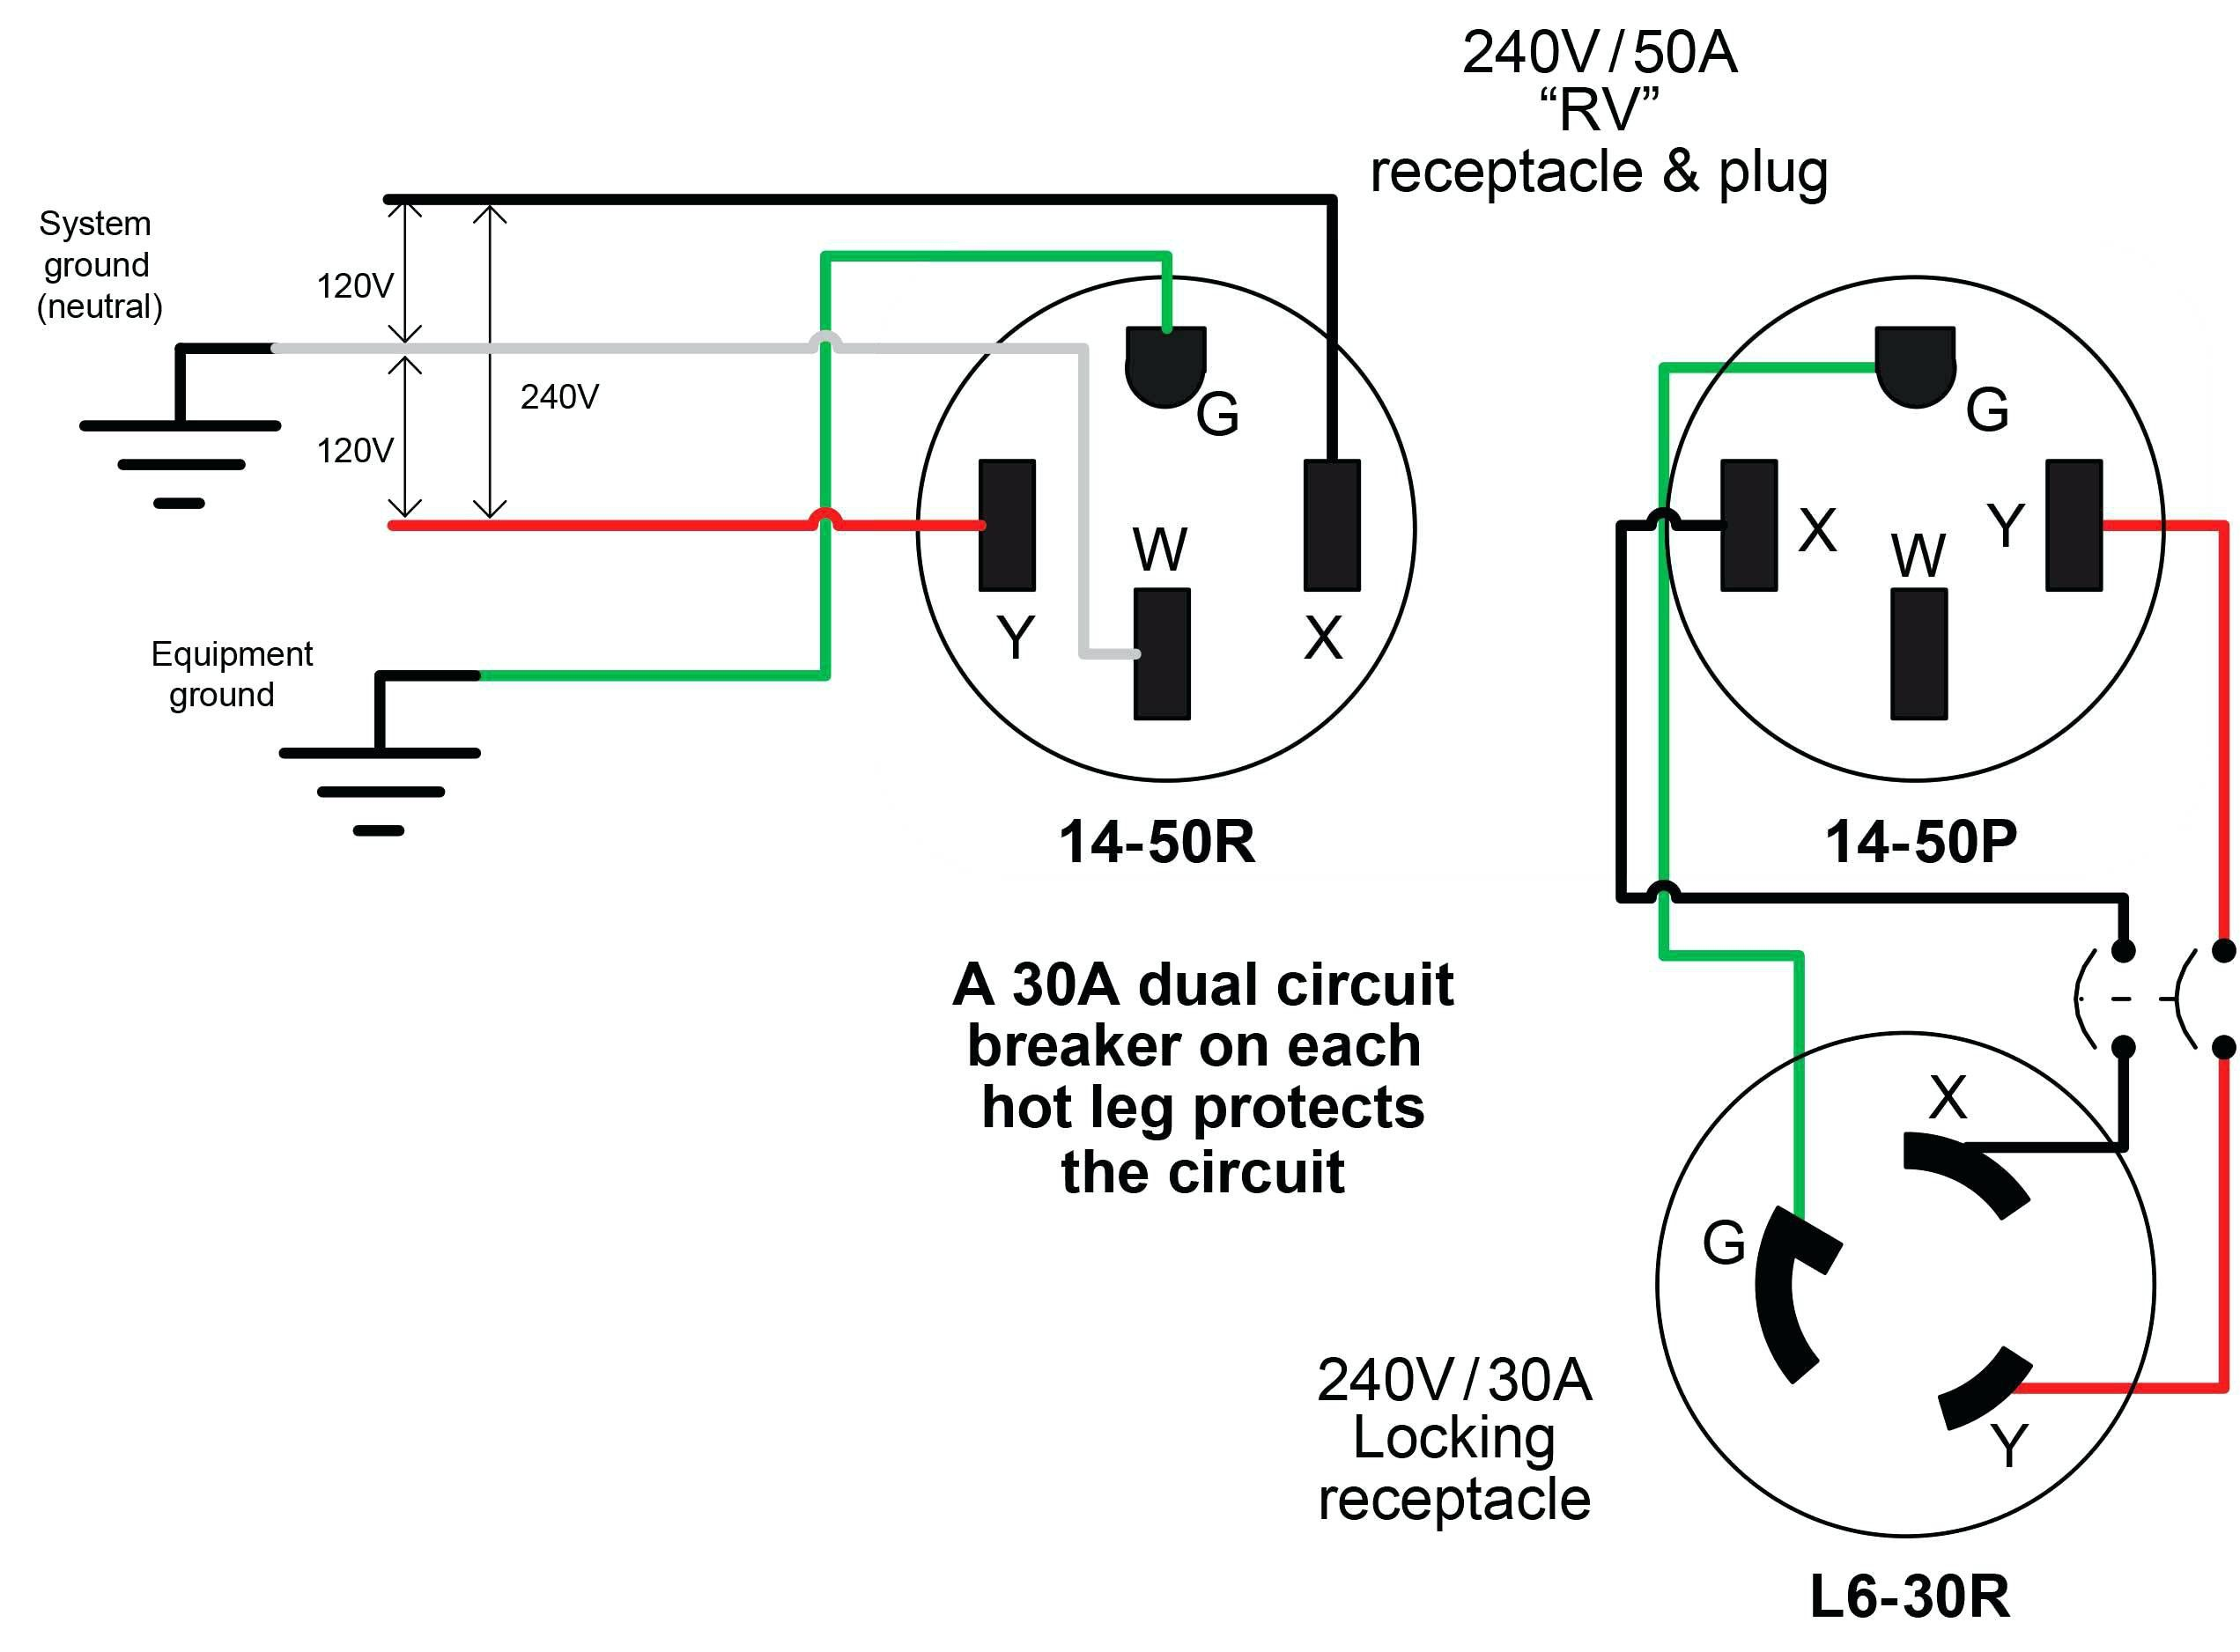 medium resolution of 240v dryer plug wiring diagram wiring diagram technic wiring diagram 240v 3 prong plug whirlpool washing machine wiring